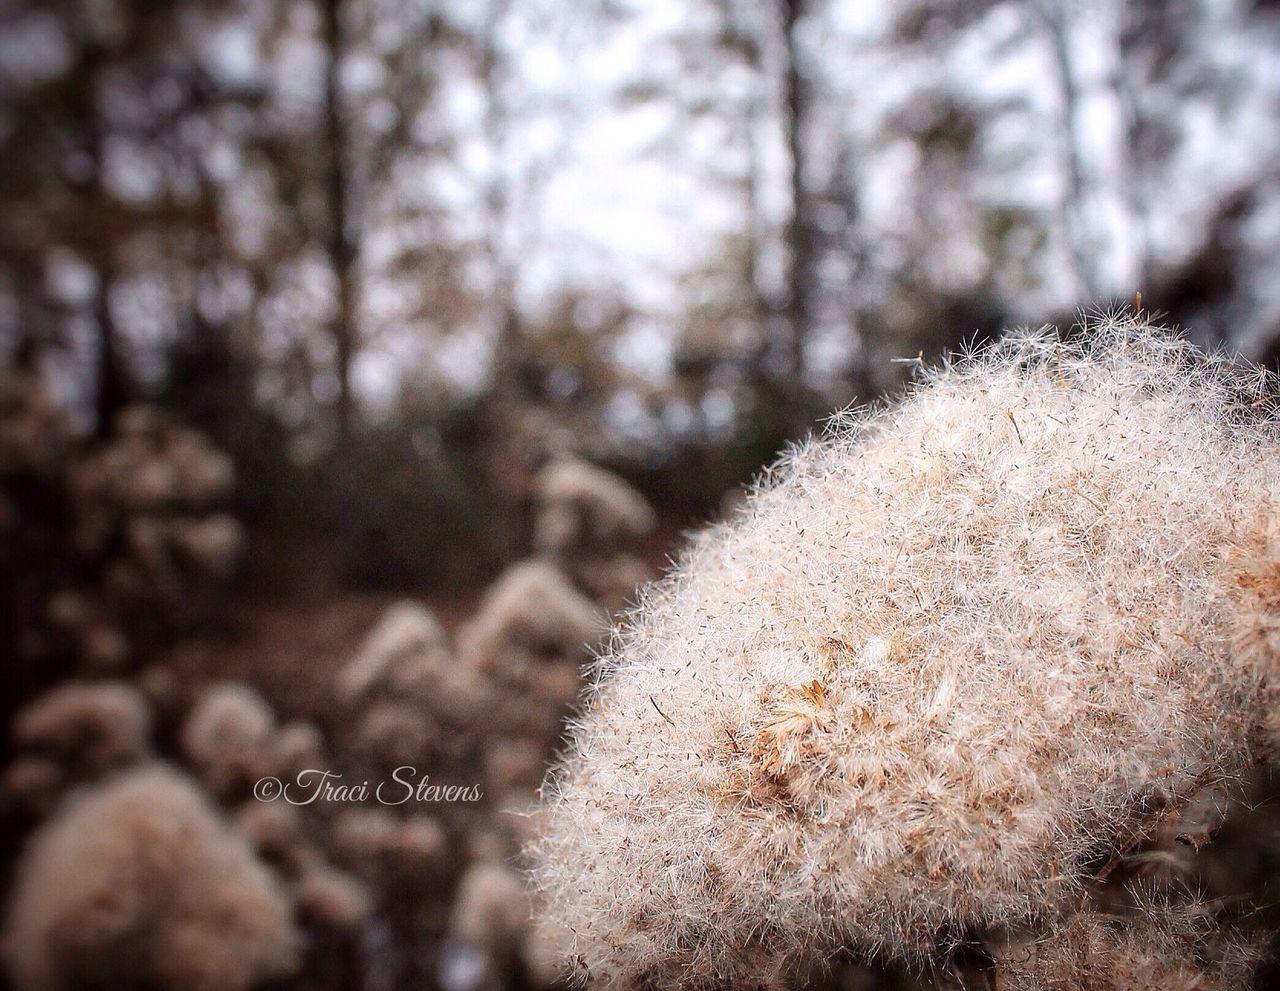 EyeEm Best Shots - Nature EyeEm Nature Lover EyeEm Best Edits